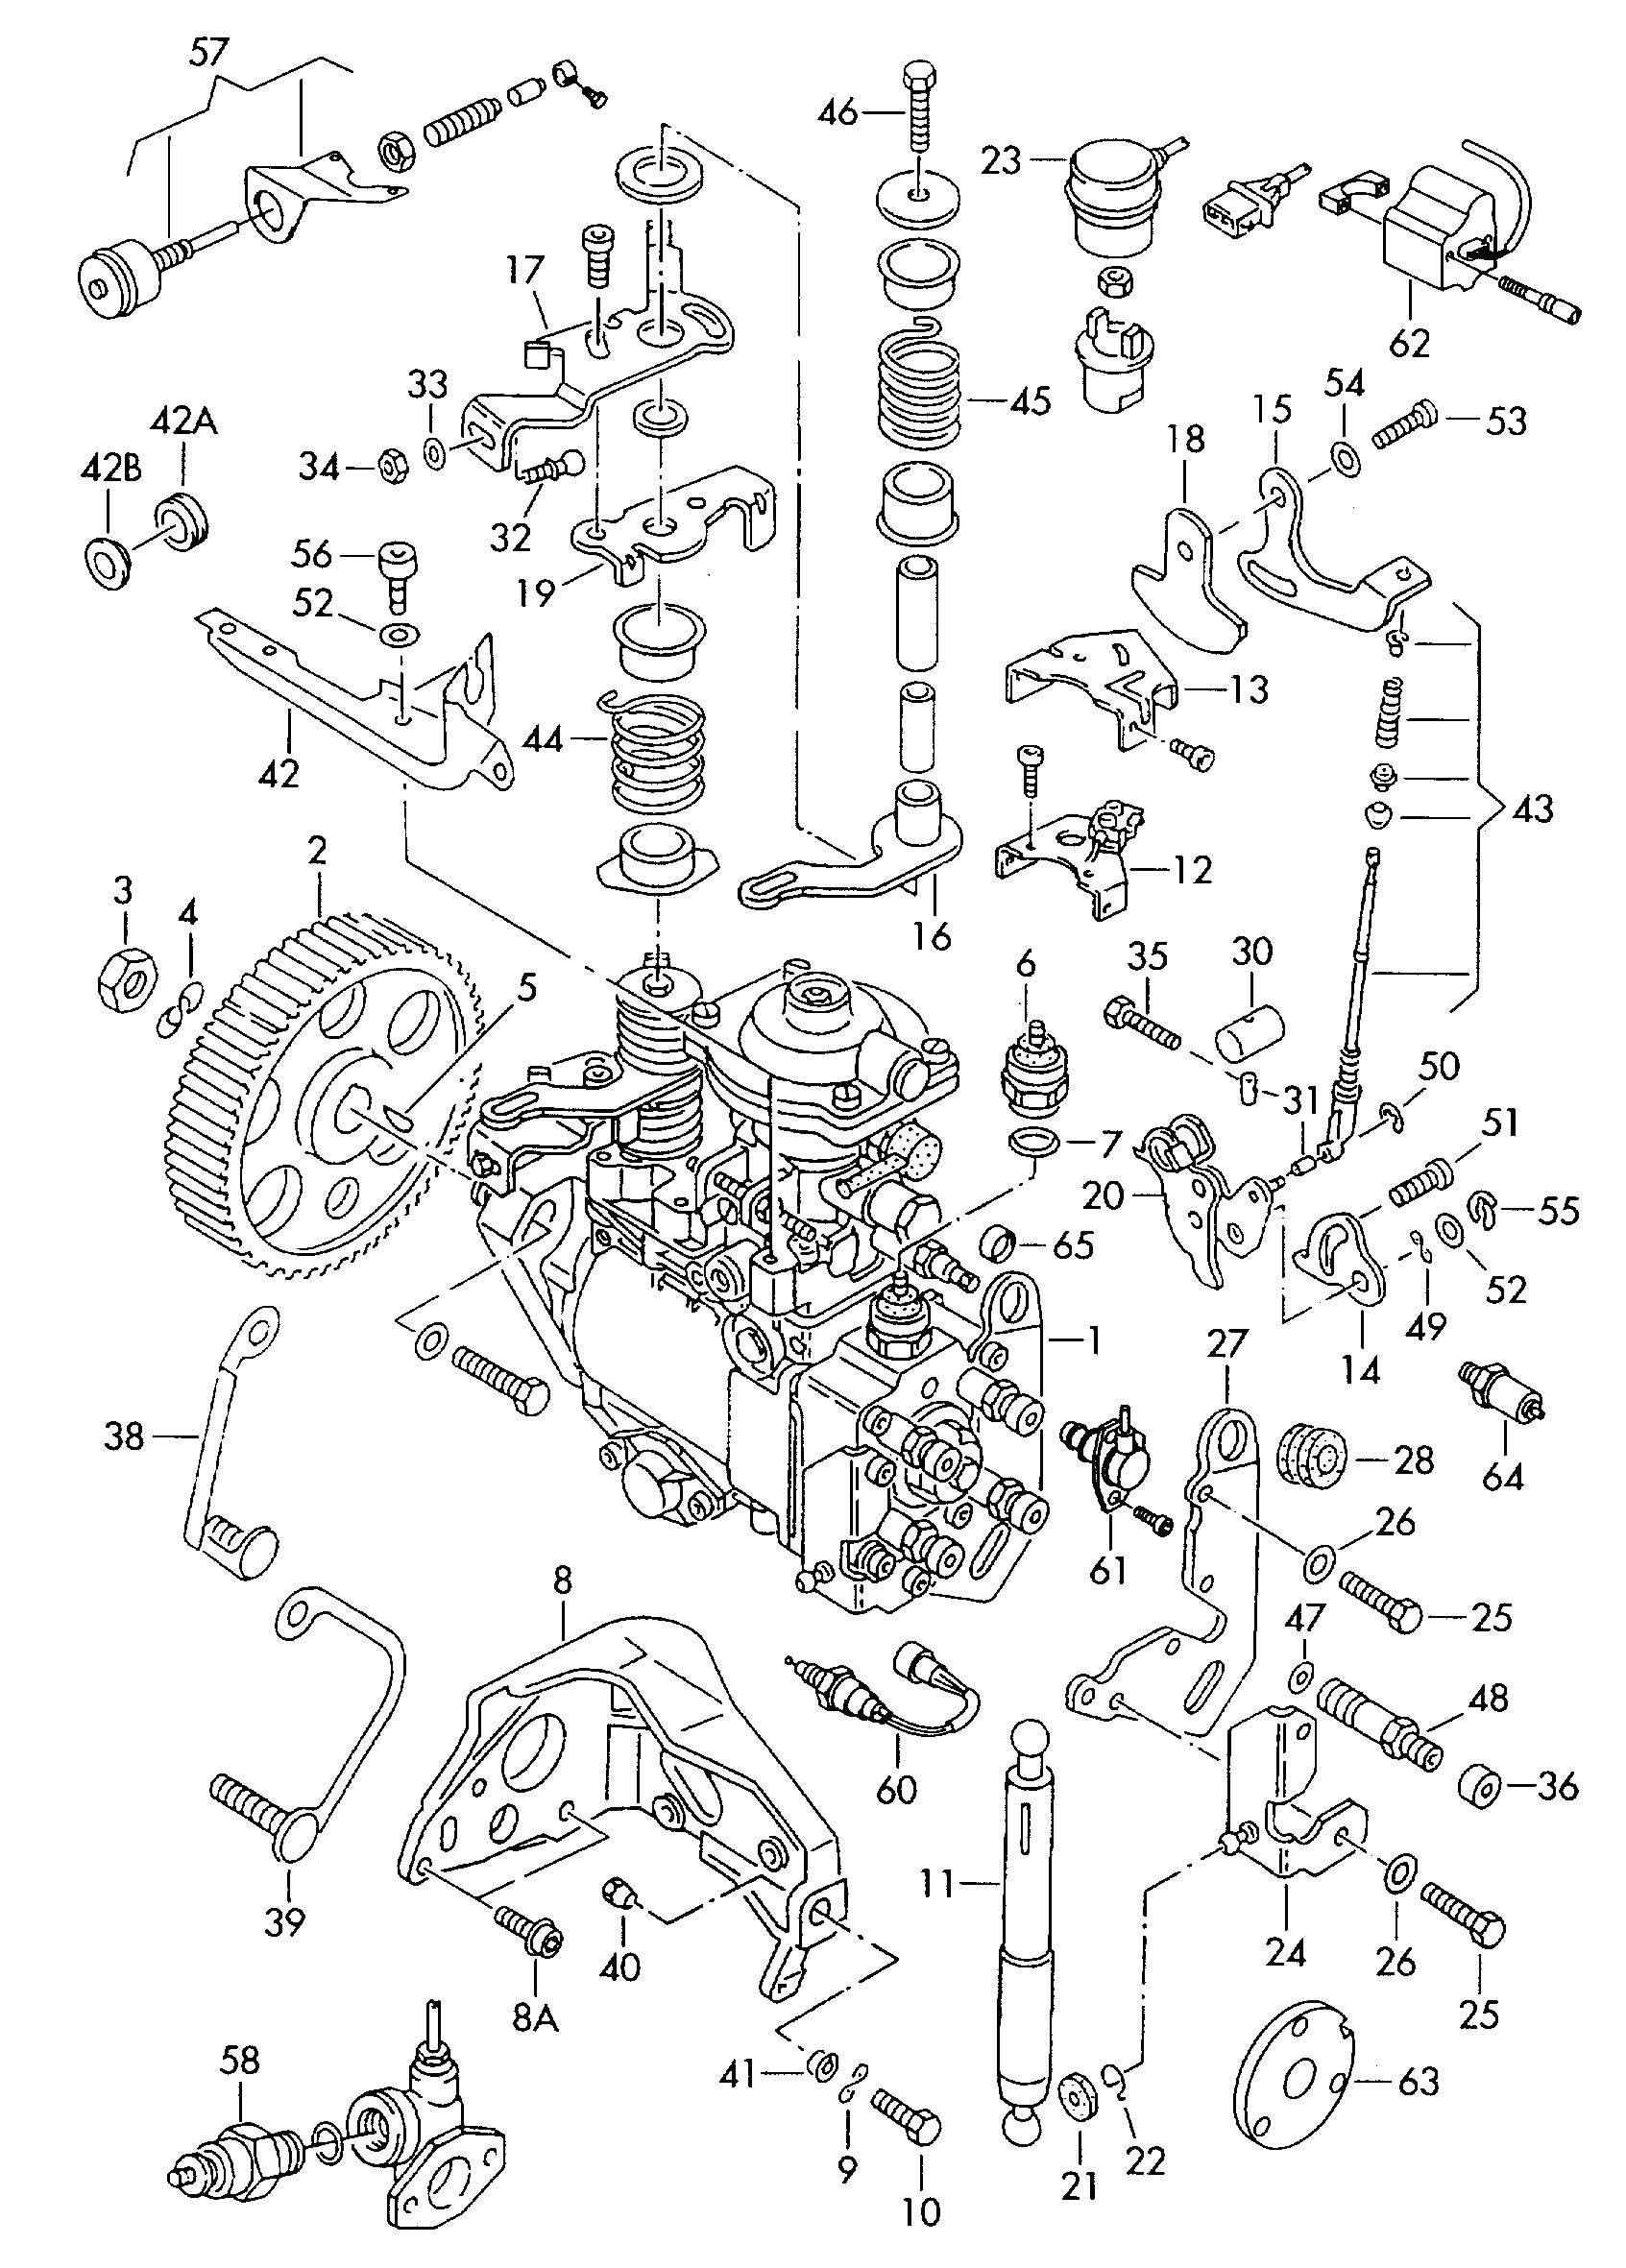 19 Inspirational Kubota Rtv 1100 Wiring Diagram